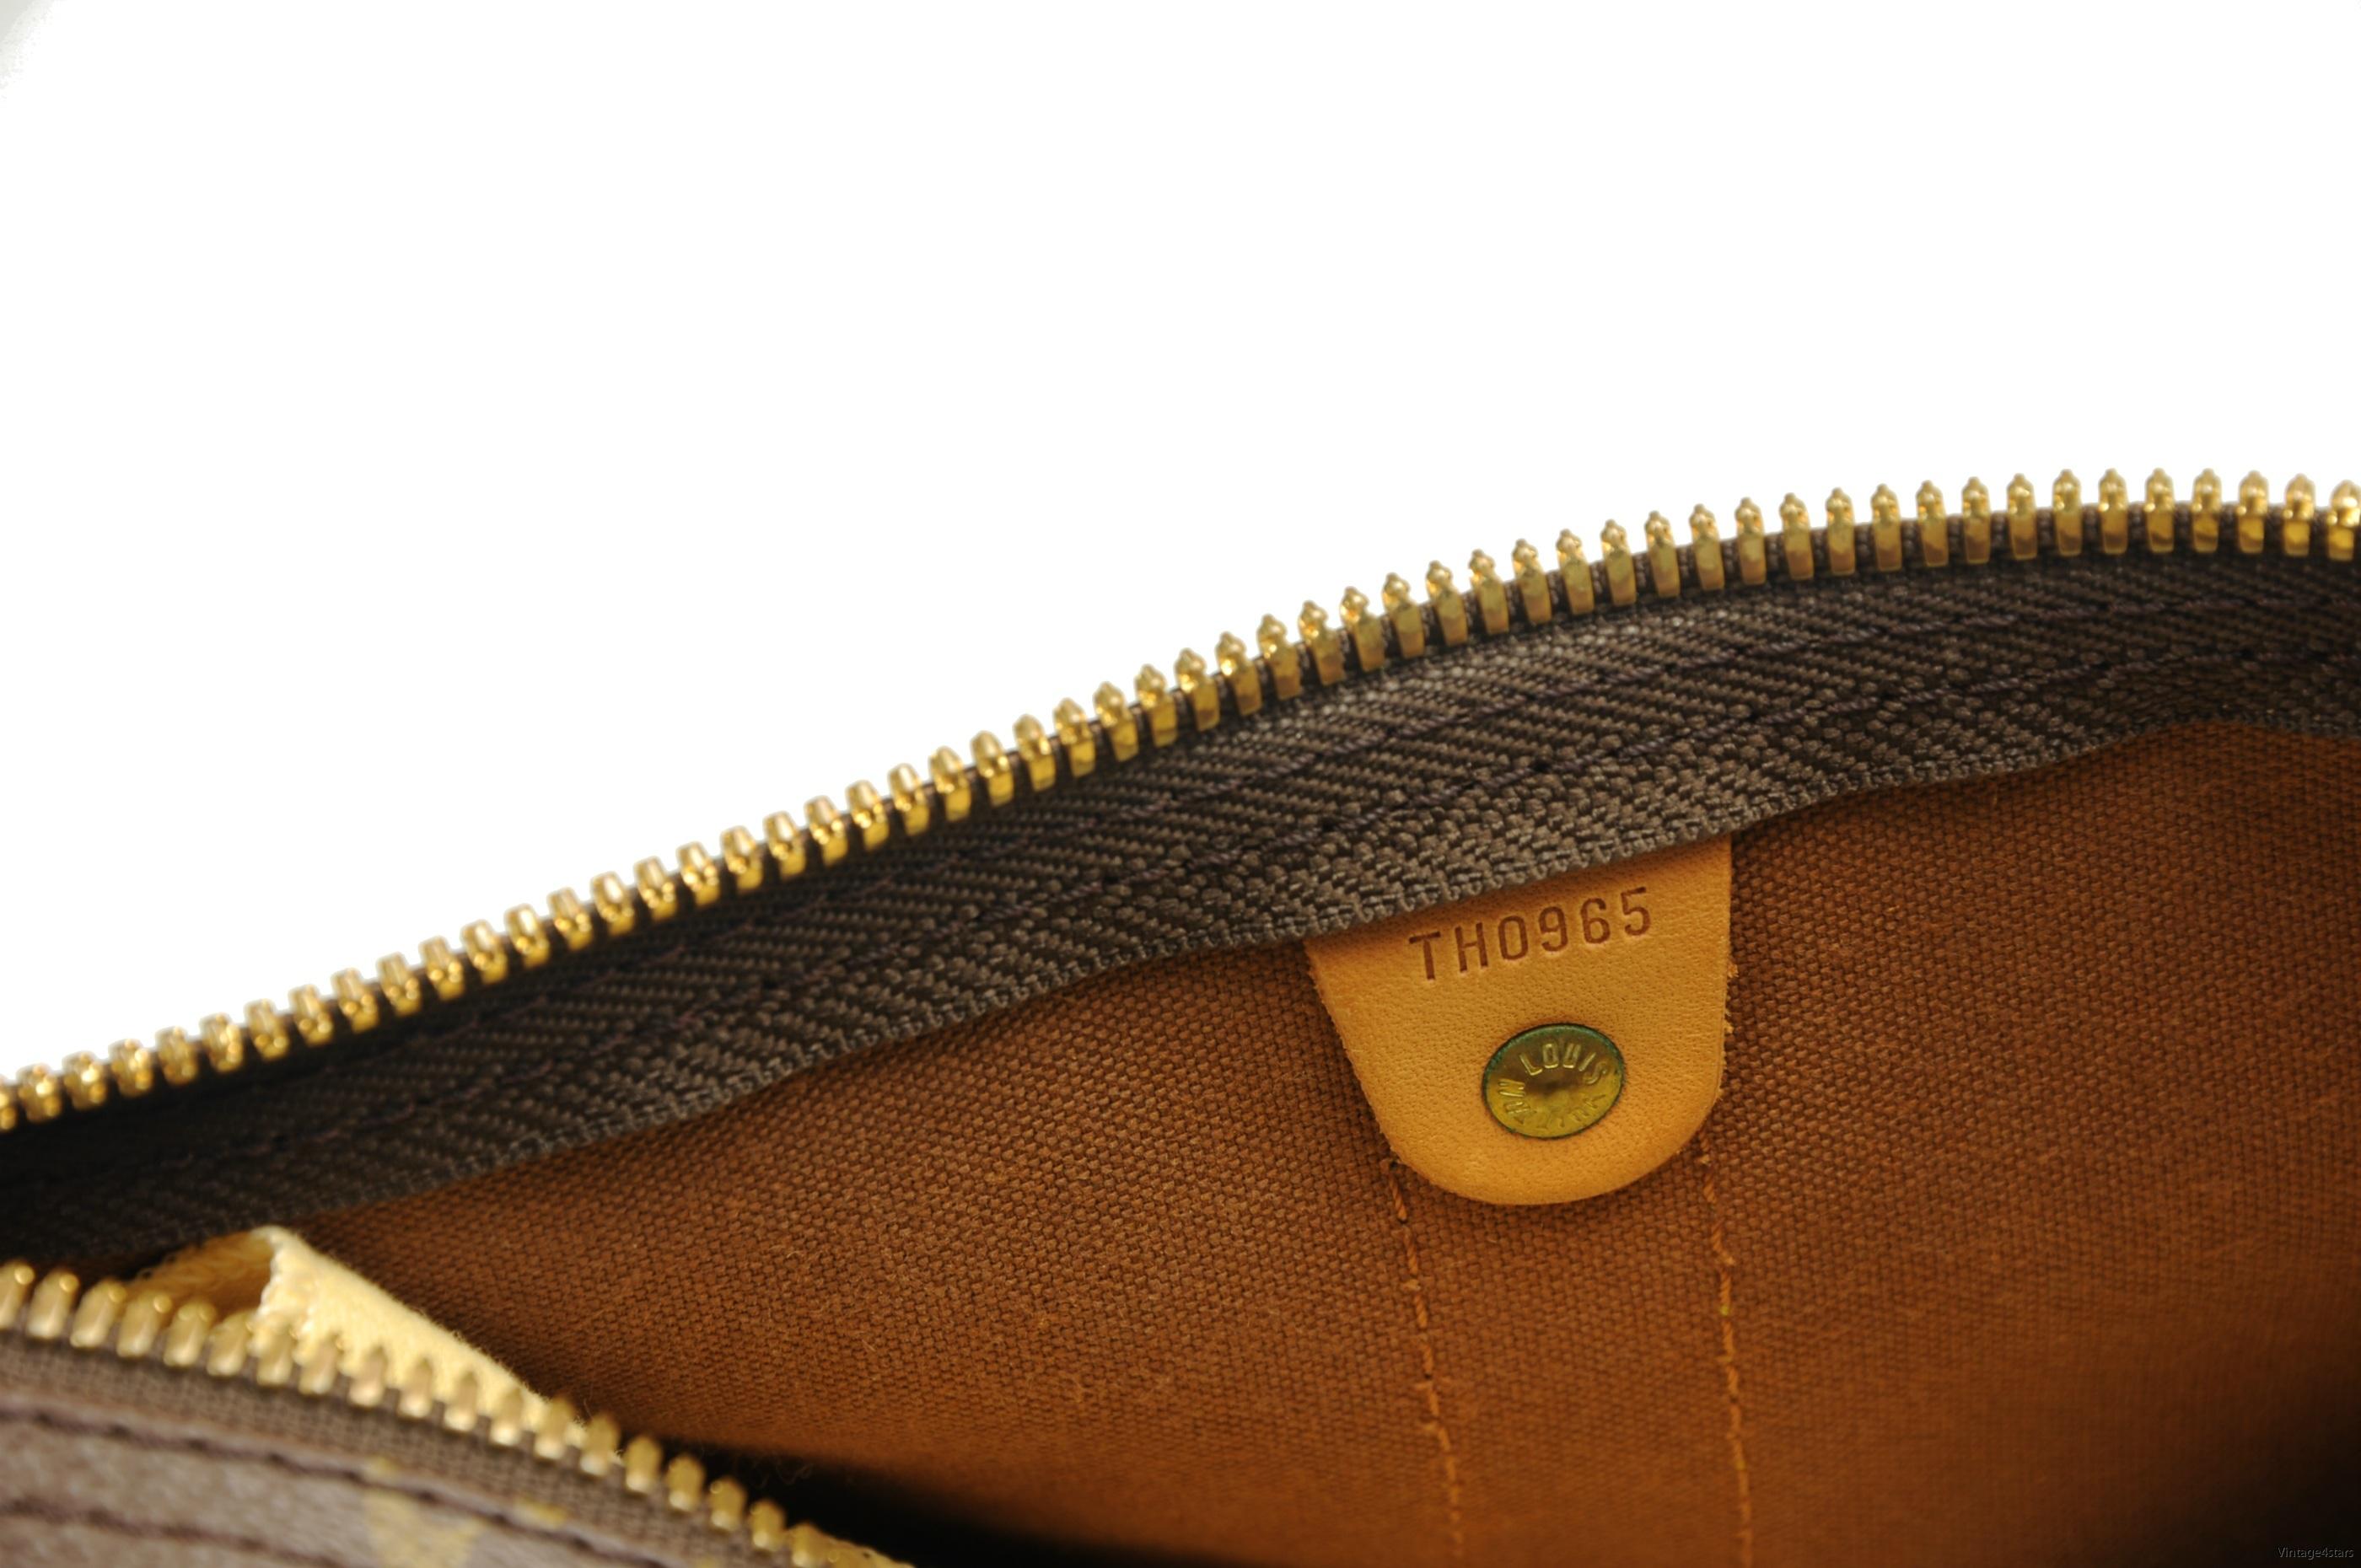 Louis Vuitton Keepall 55 Monogram 13